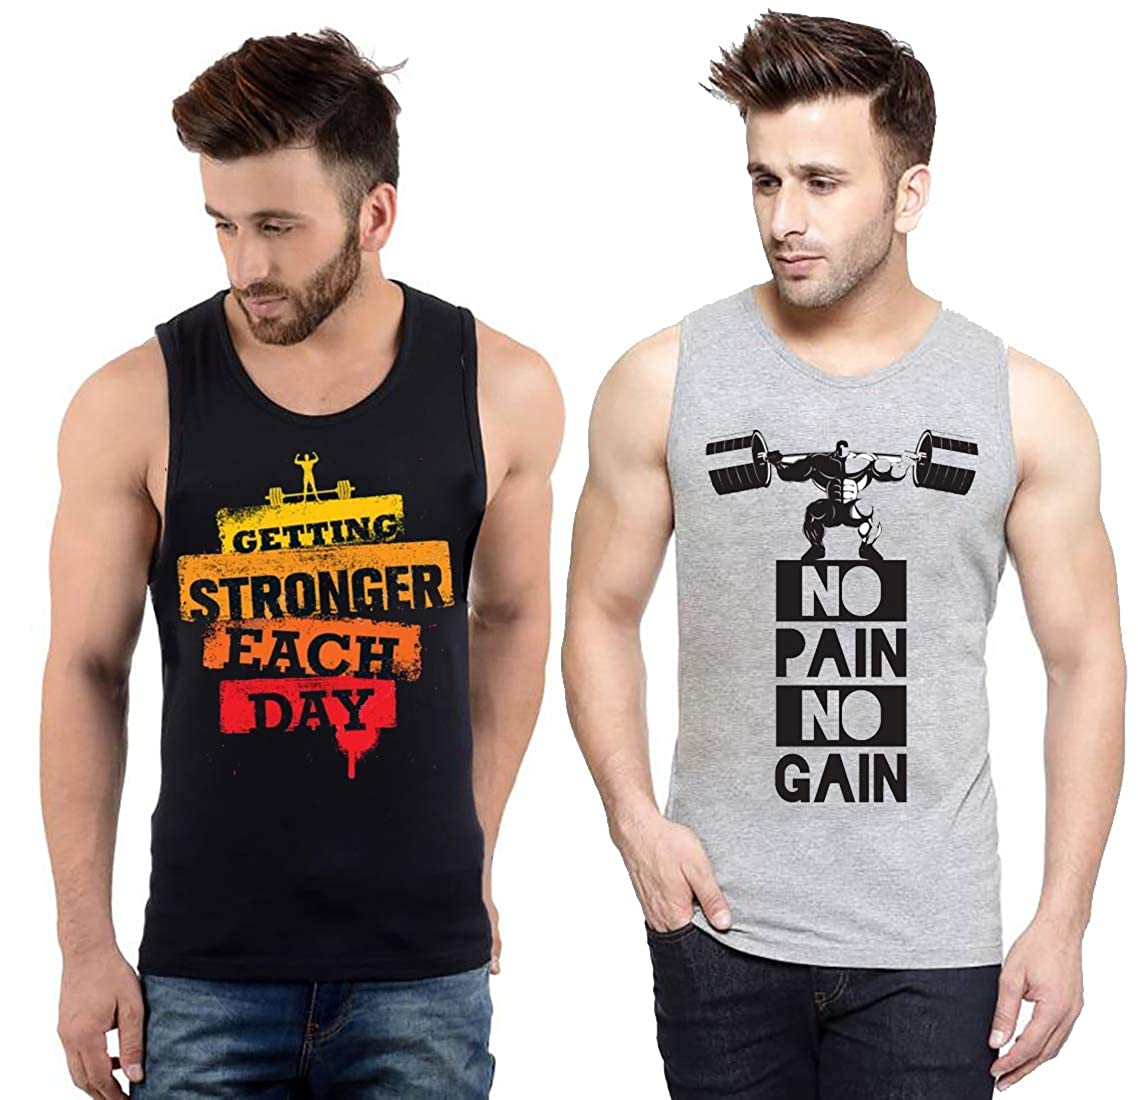 Hotfits Men's Multi-Coloured Gym Sleeveless Tshirt -Pack of 2